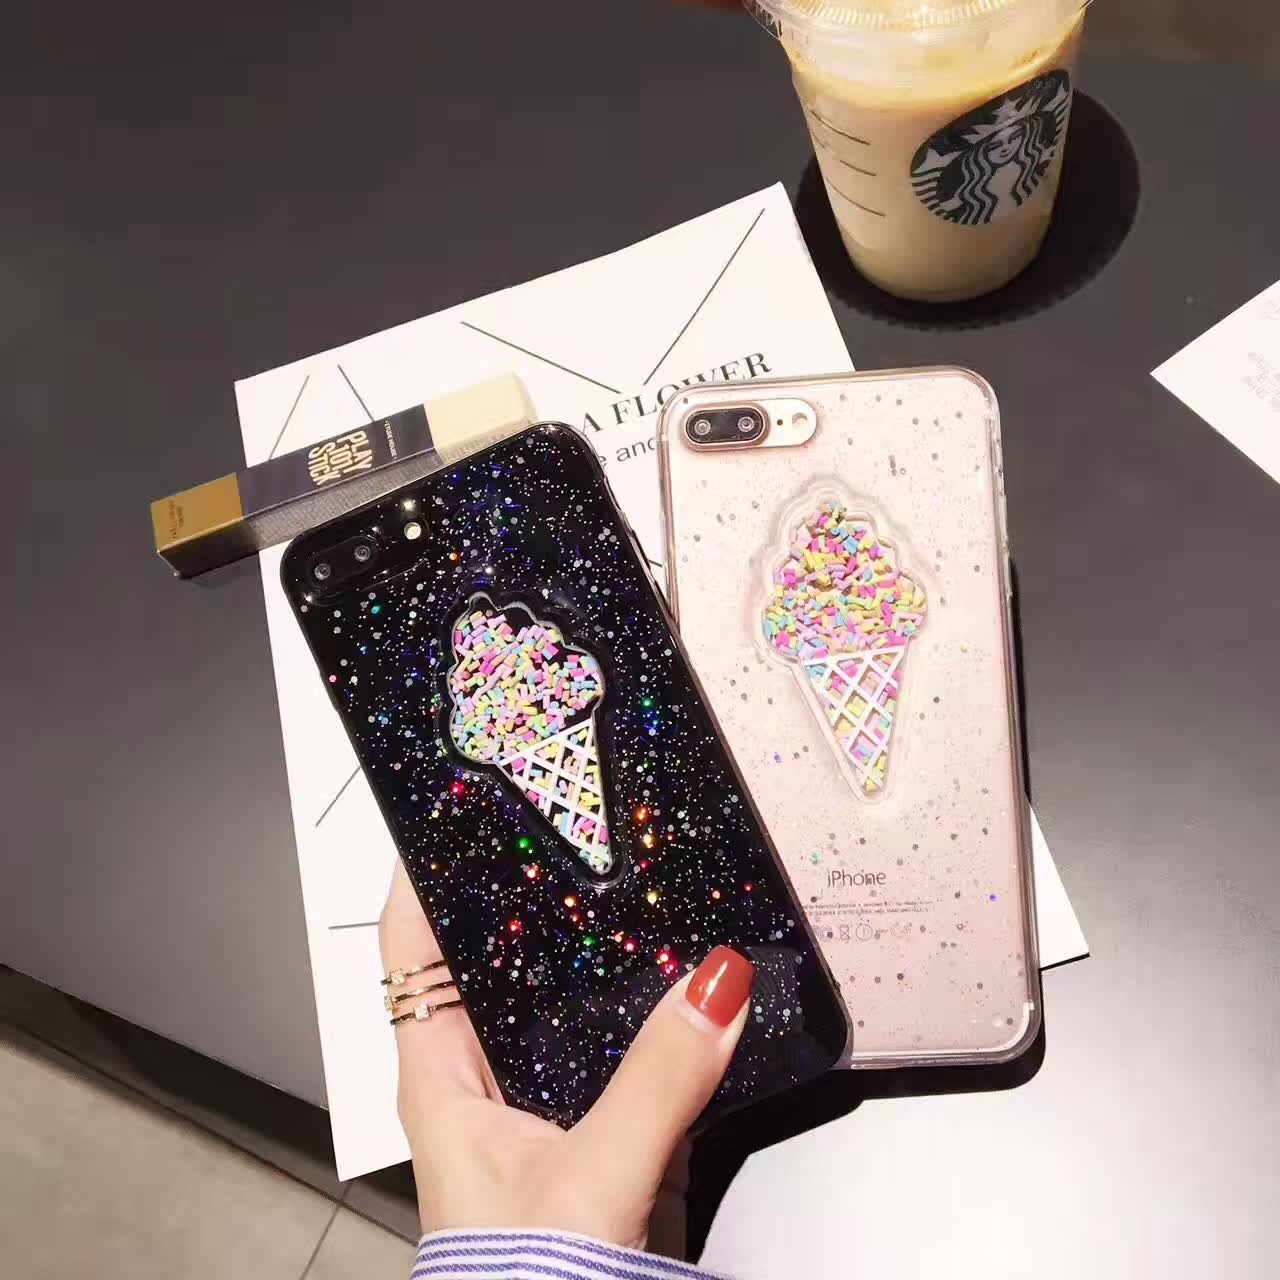 Galleria fotografica AIBOR Lovely Summer 3D Ice Cream Phone Case For iPhone X 6 6S Plus 7 7Plus 8 Plus Shining Glitter Powder Soft Back Cover Coque